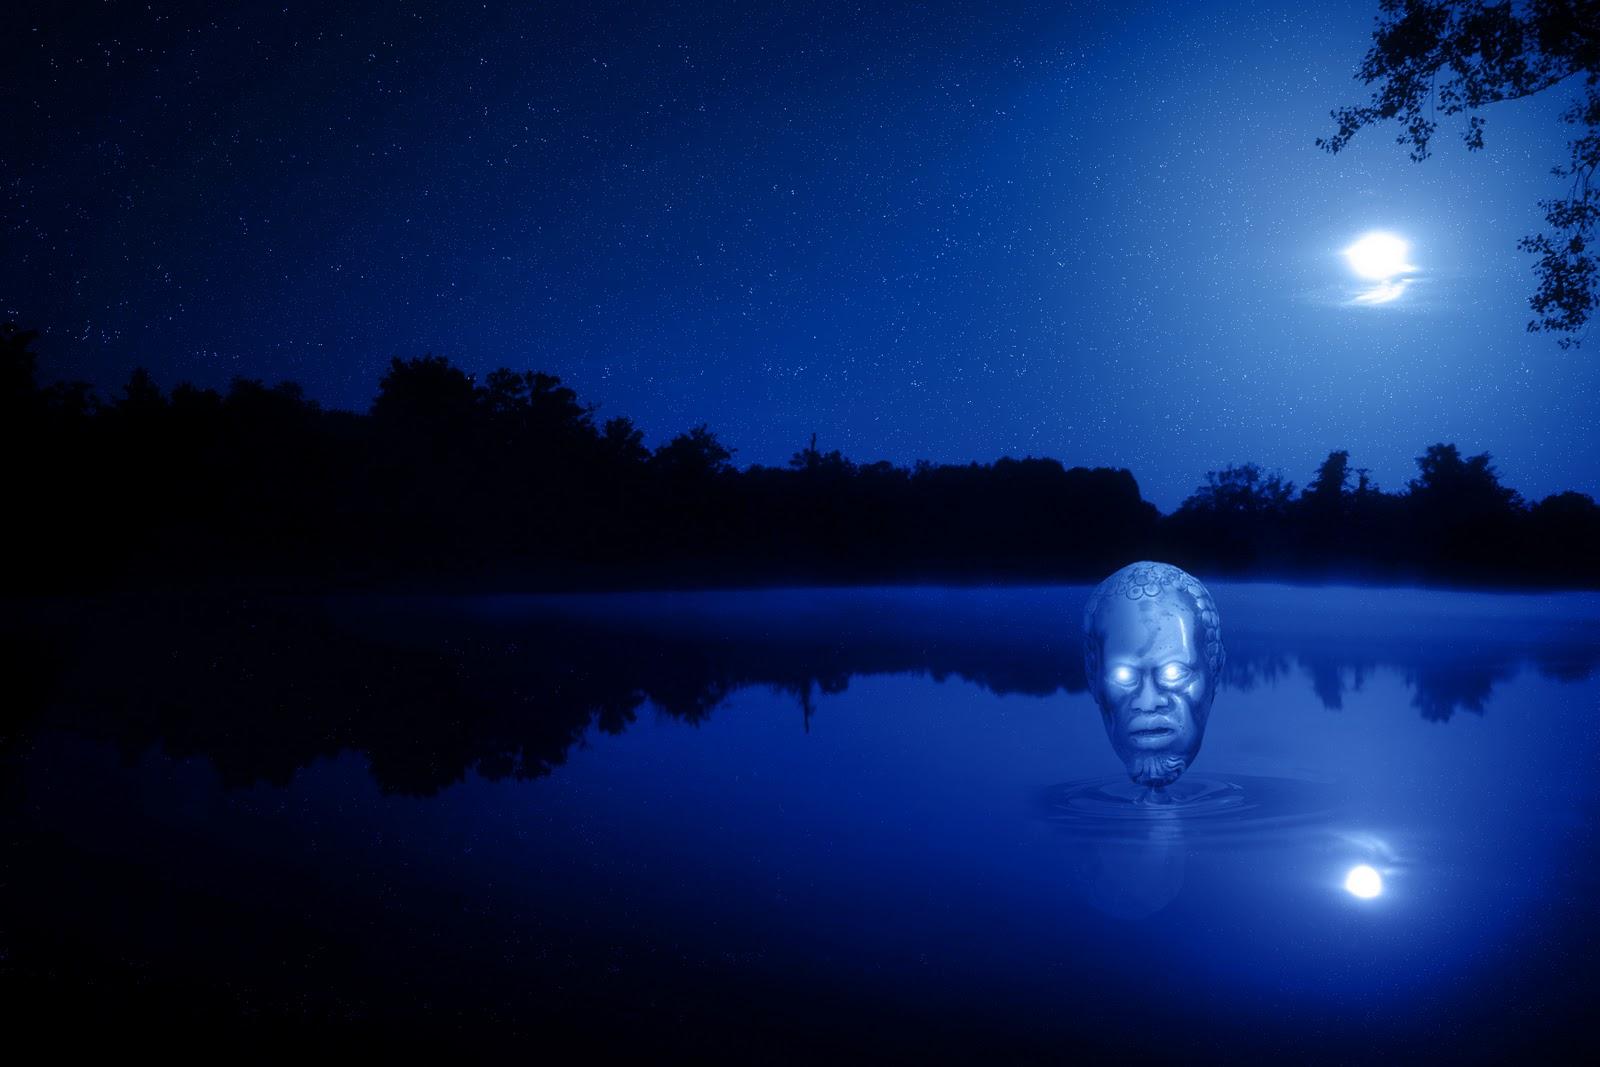 http://4.bp.blogspot.com/-x6yE2mE0baY/TZyU7KQ5c4I/AAAAAAAABZU/dB6CKsmrJn8/s1600/River_god.jpg